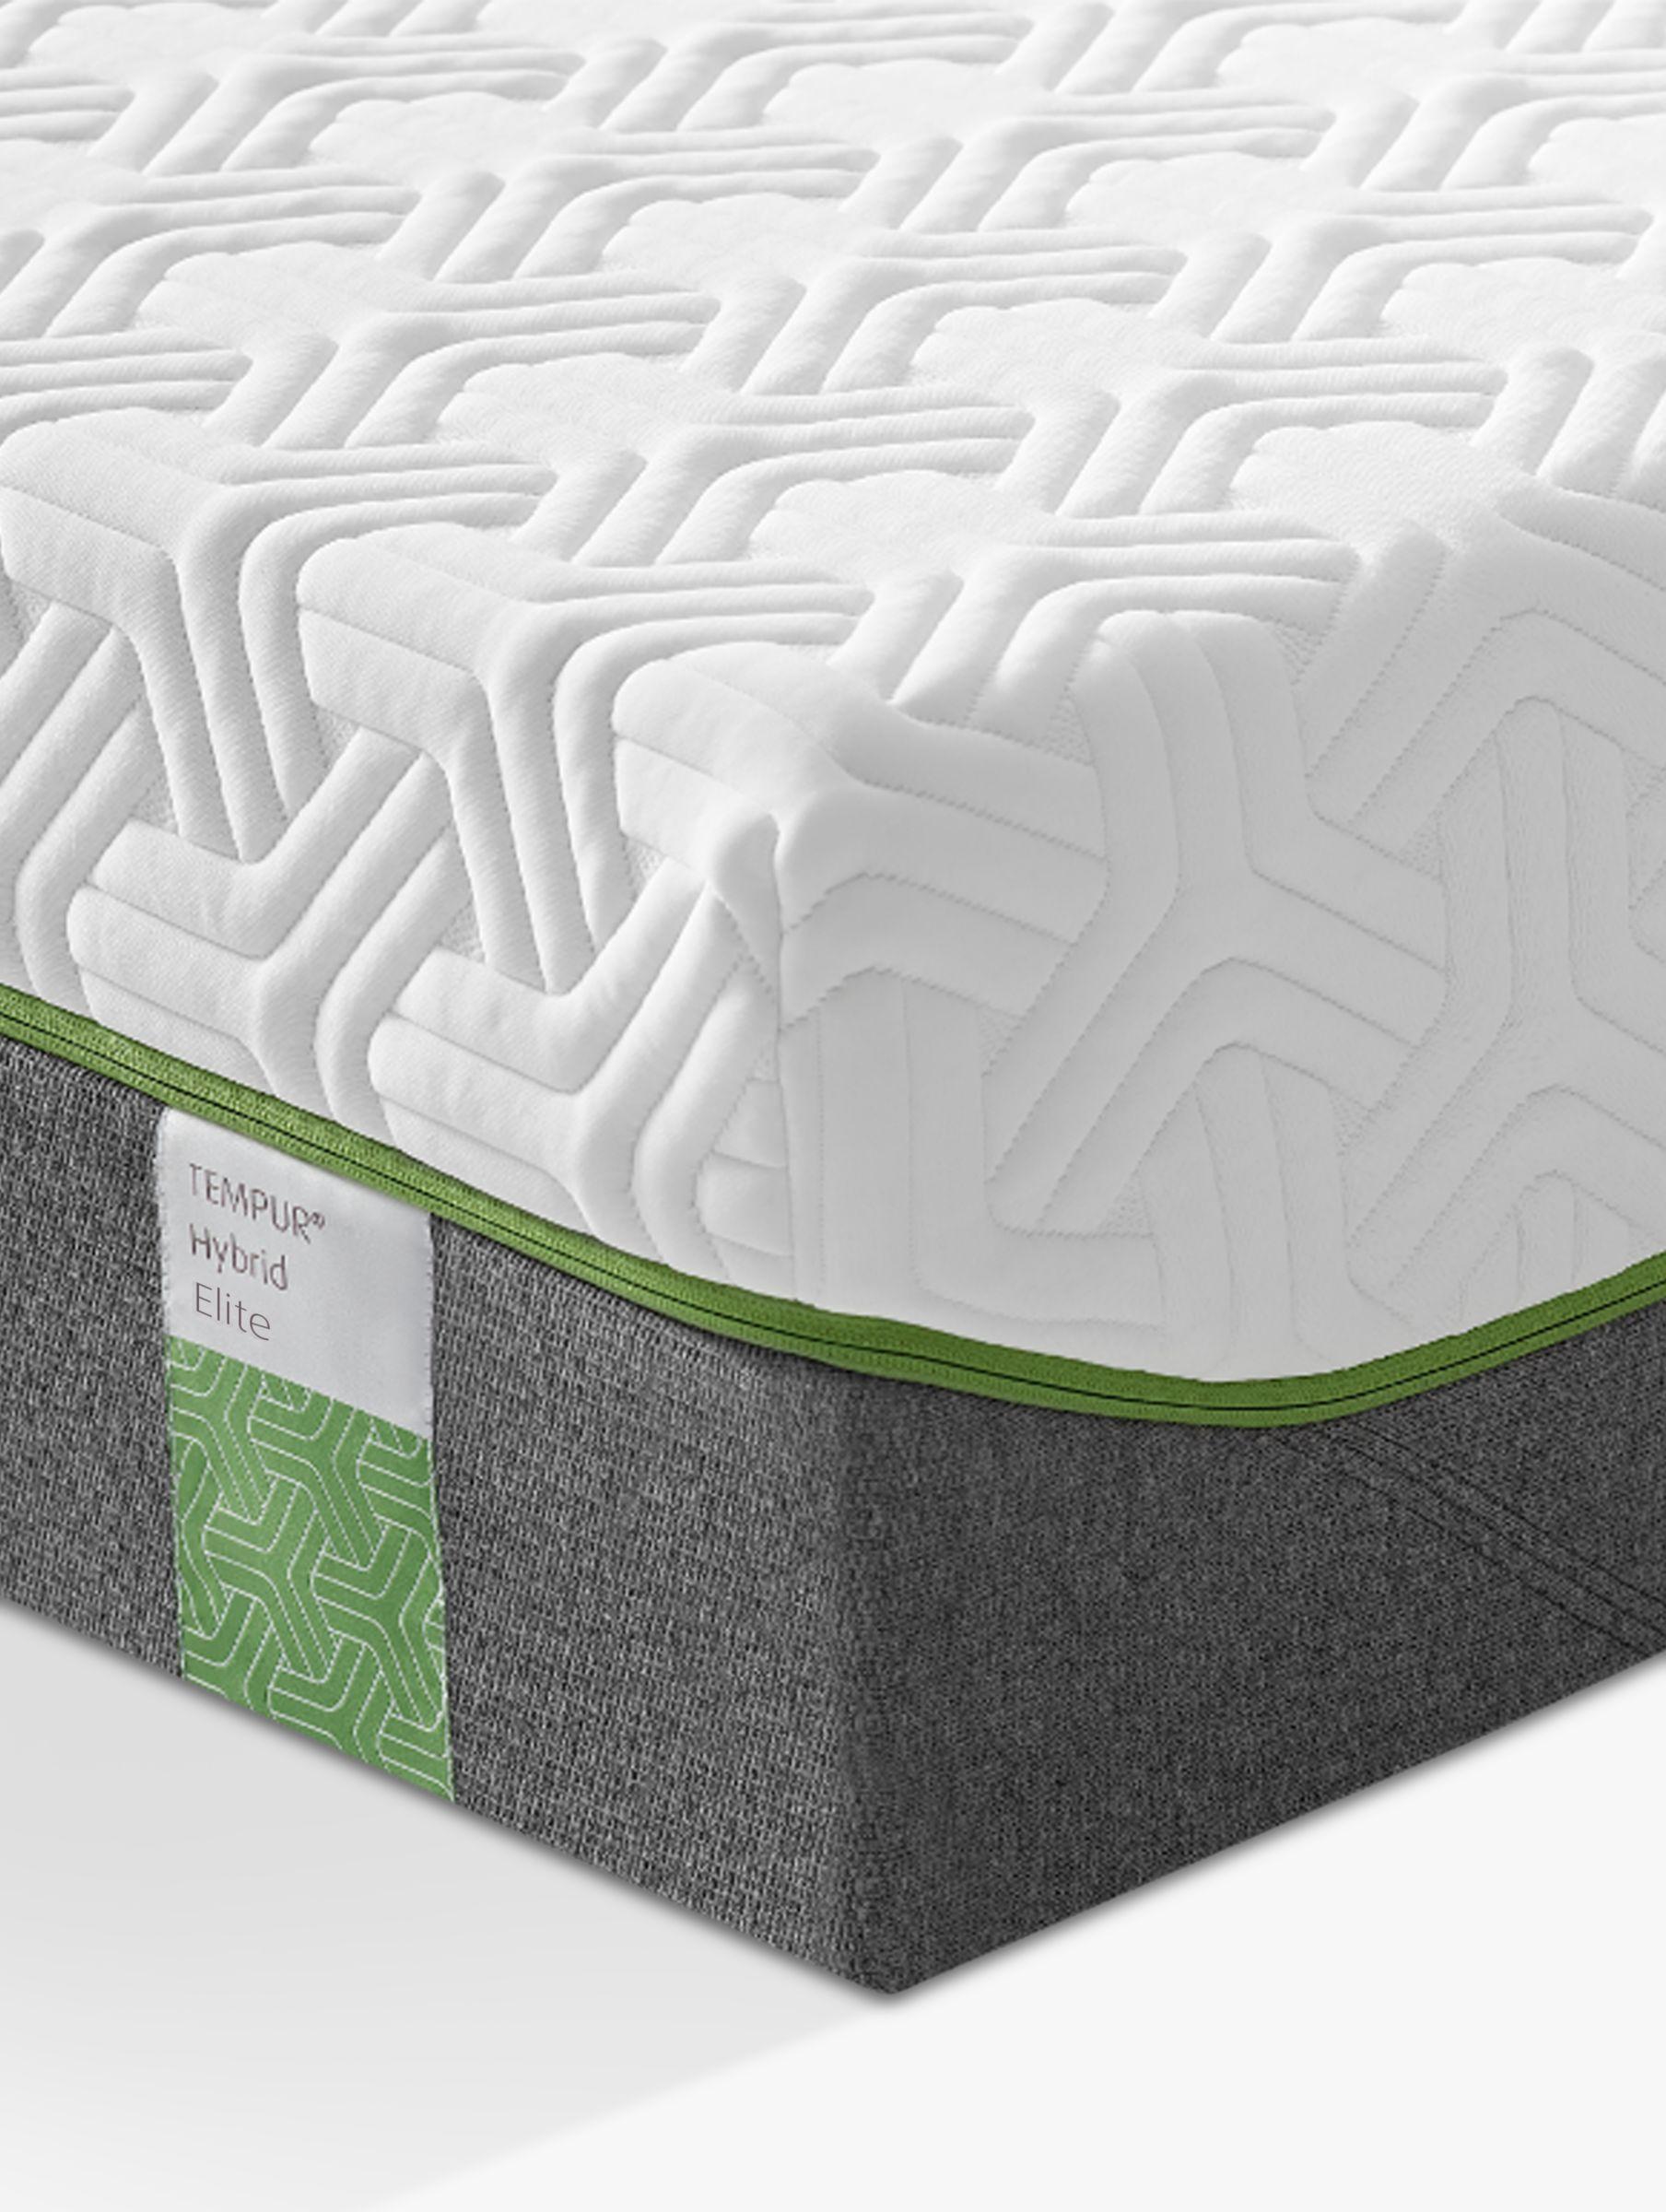 Tempur Tempur Hybrid Elite 25 Pocket Spring Memory Foam Mattress, Medium Tension, Continental King Size